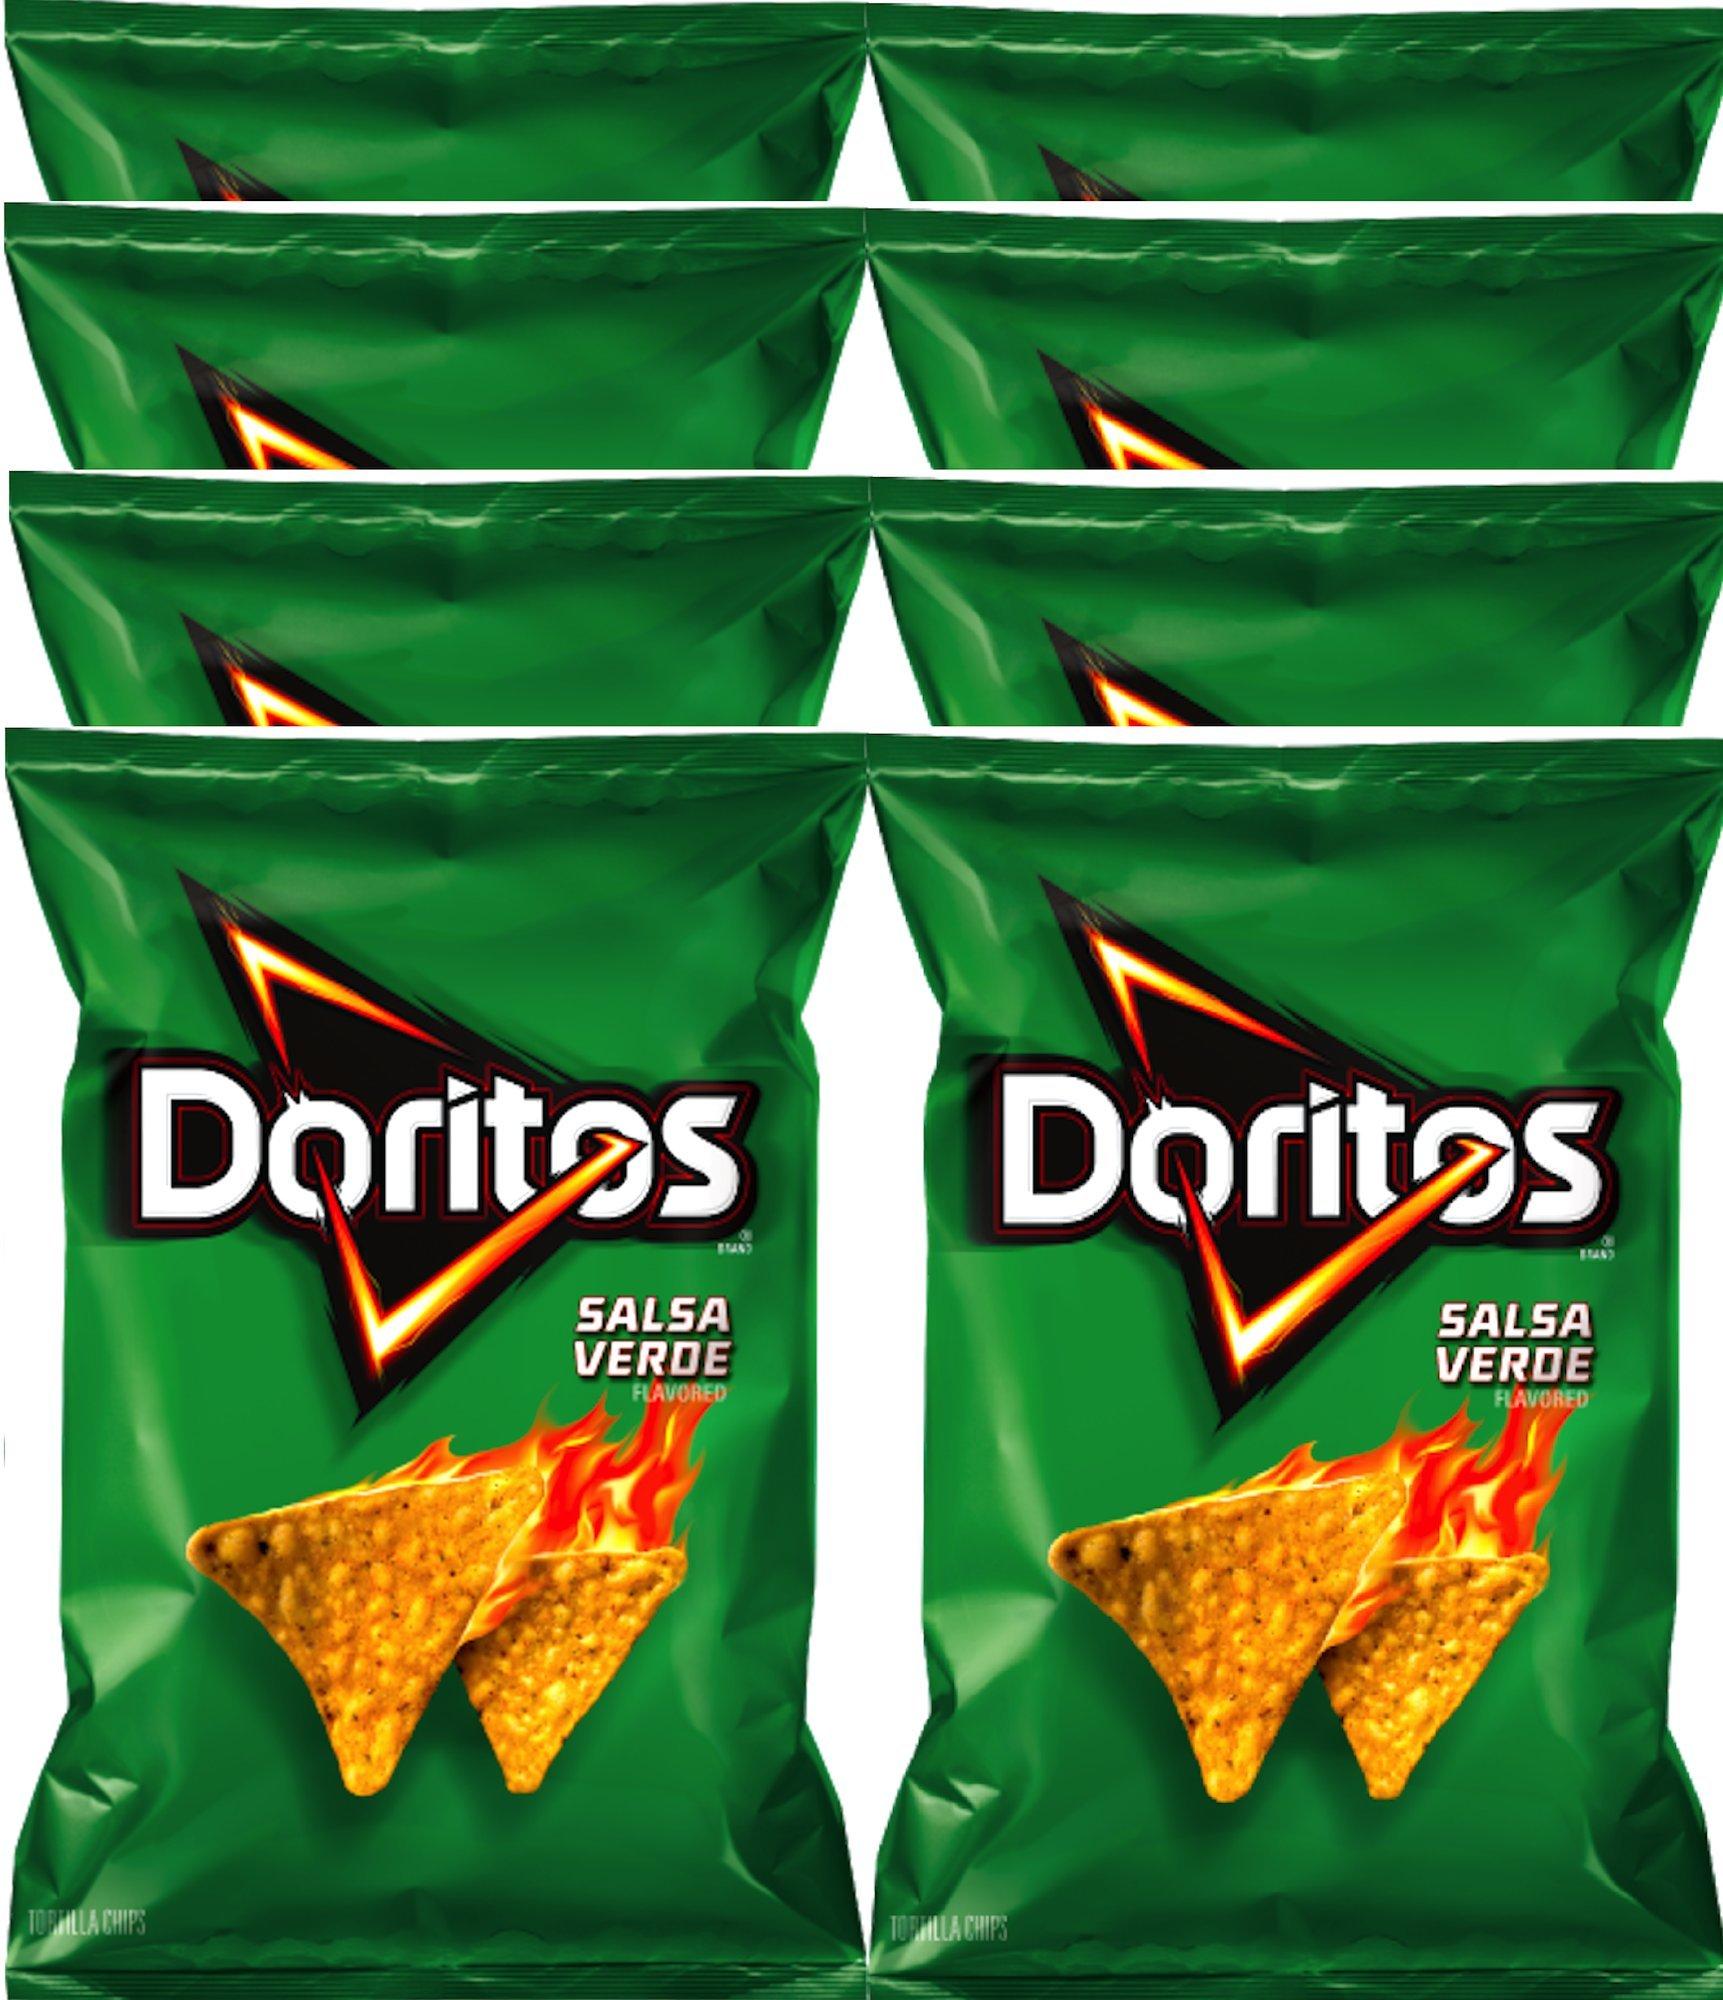 Doritos Salsa Verde Flavored Tortilla Chips 9.75 oz Bags (8) by Doritos